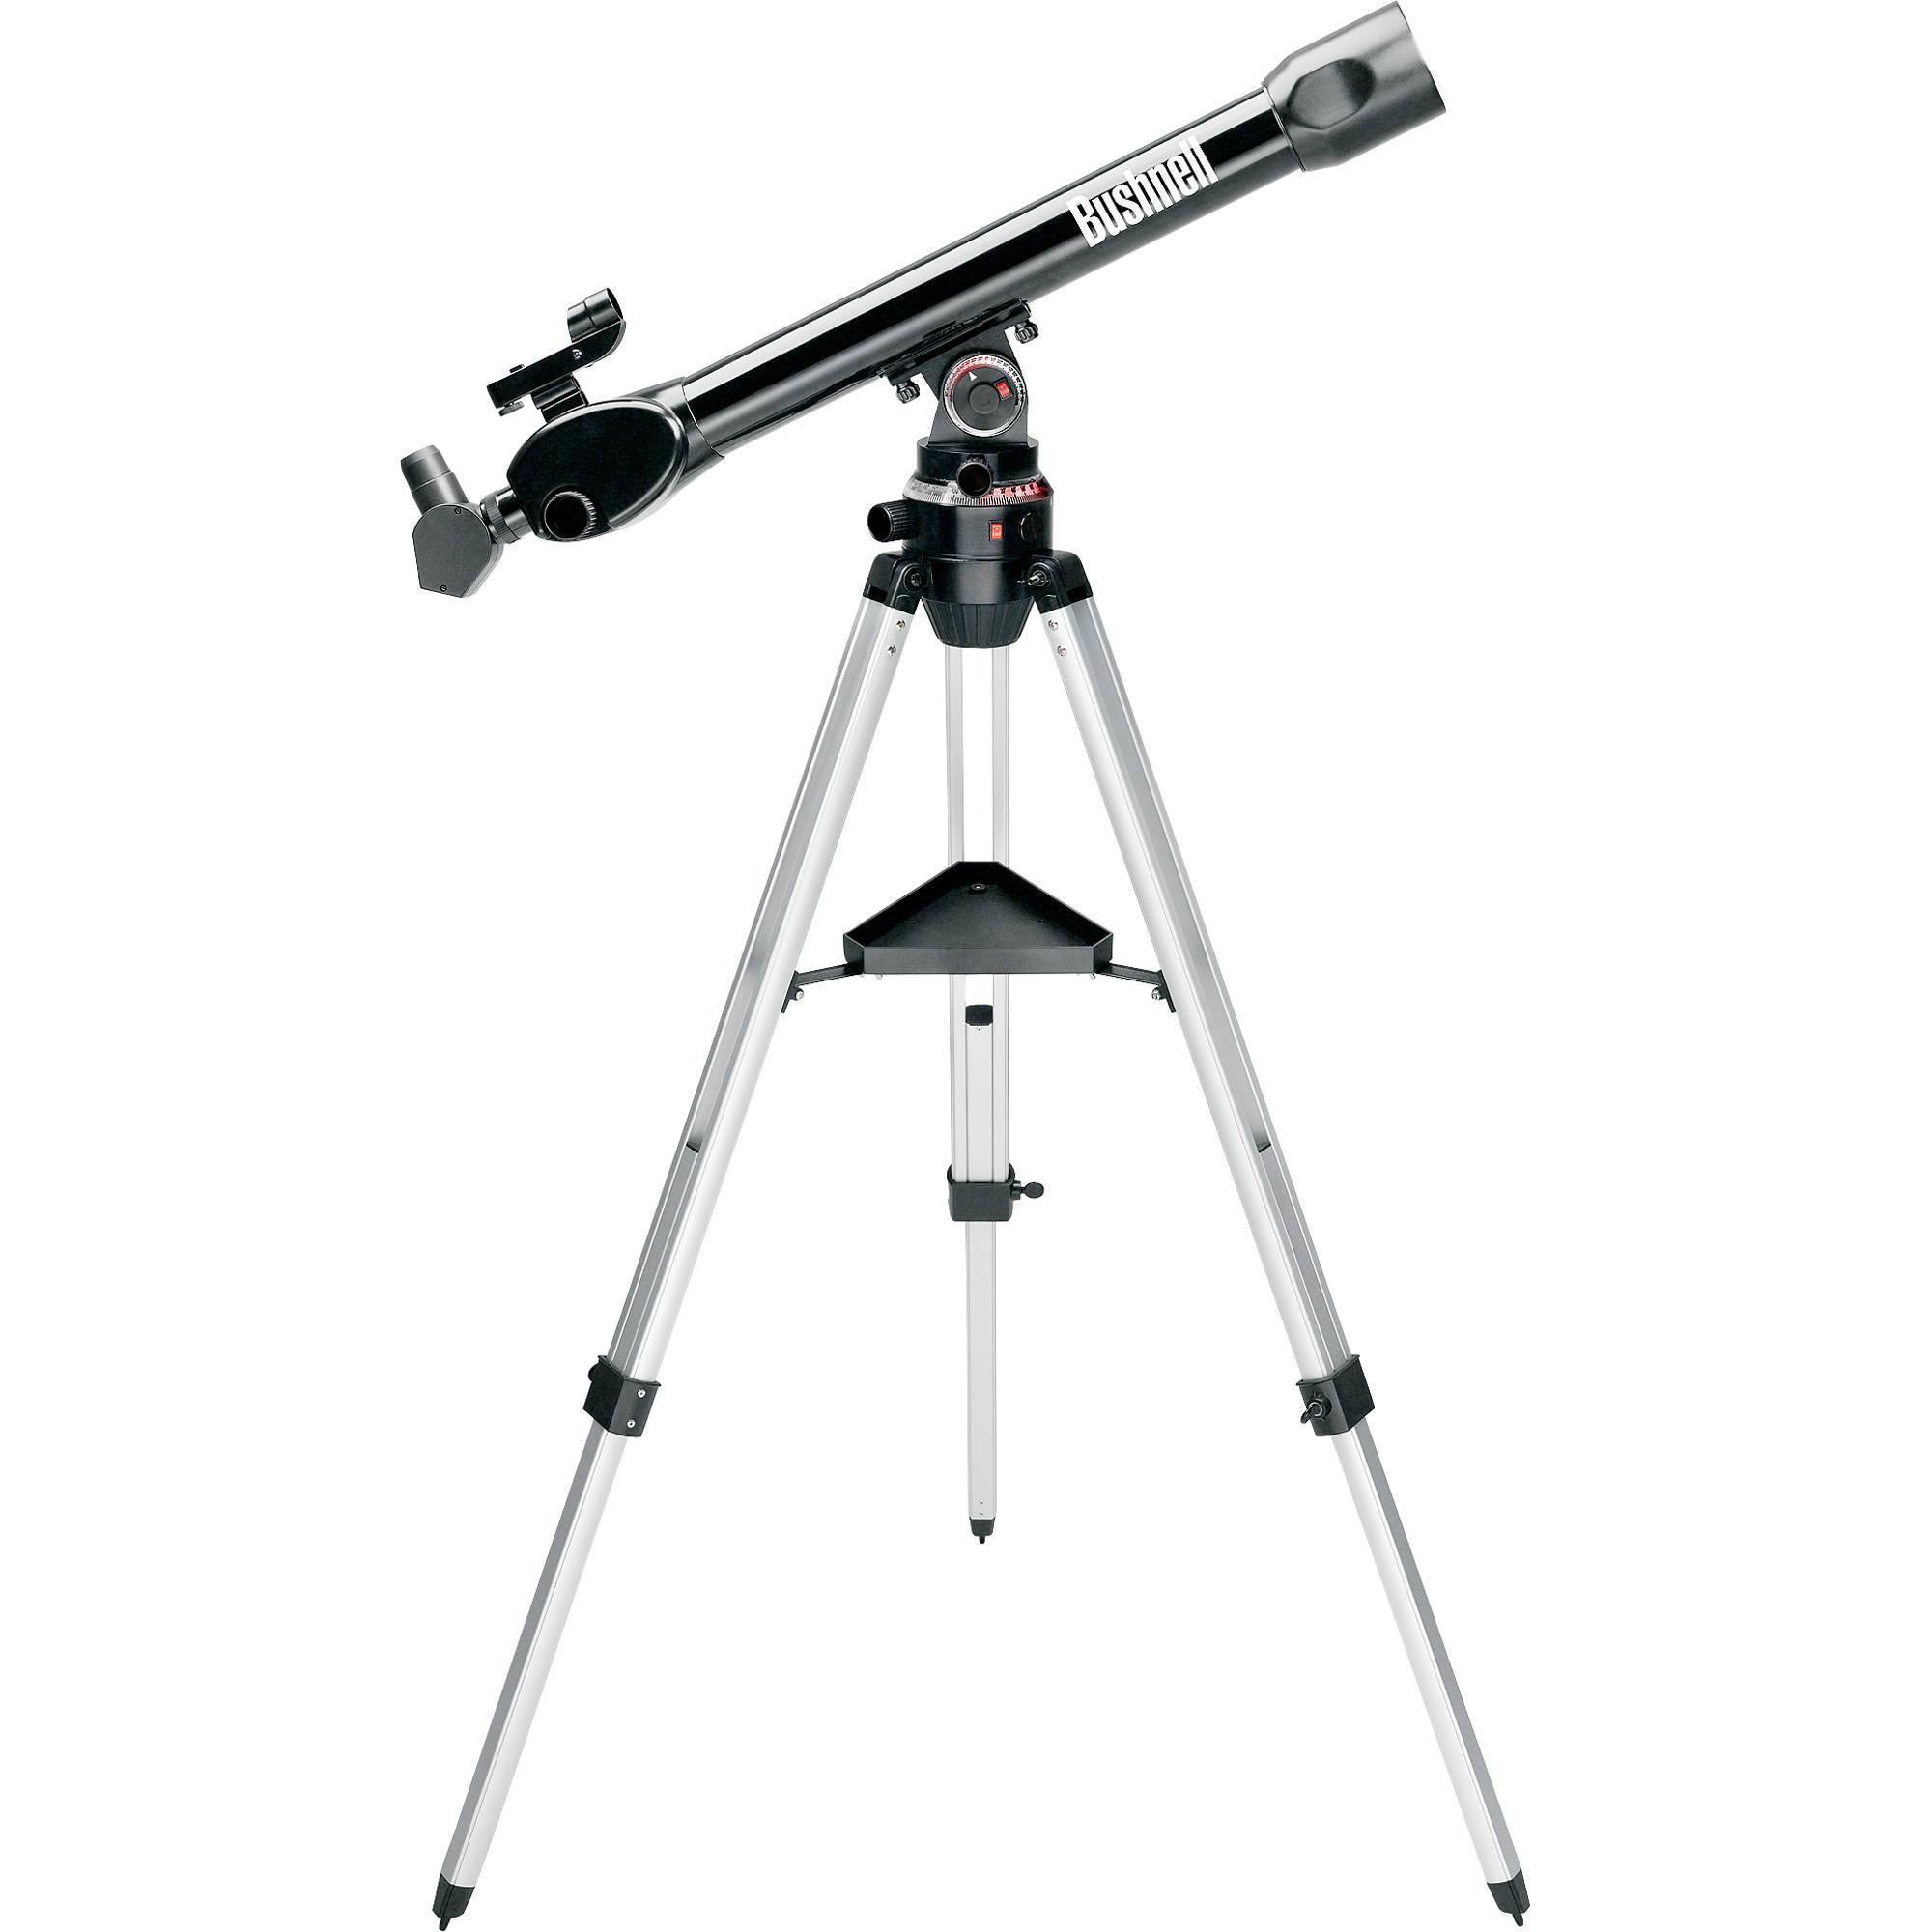 Bushnell Voyager Sky Tour 800x70mm Refractor Telescope 789971